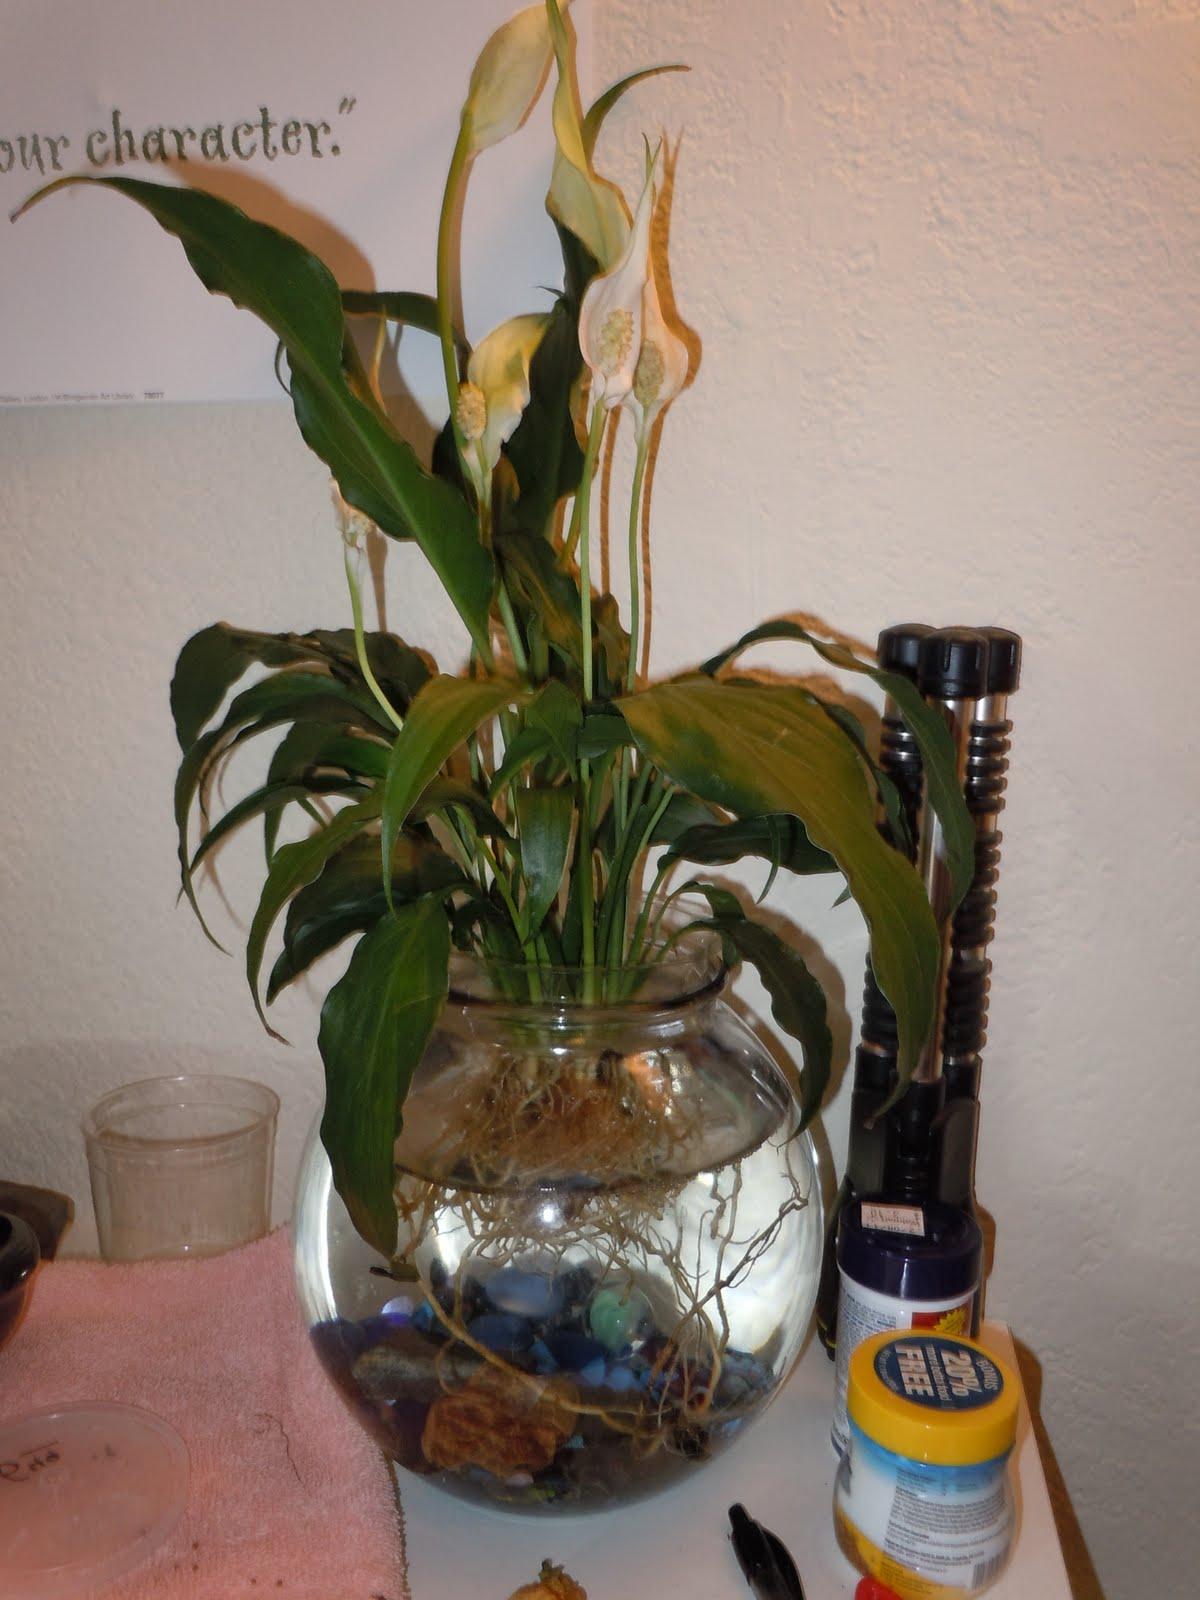 Plants for betta fish live aquarium plants pictures ep for Betta fish plant